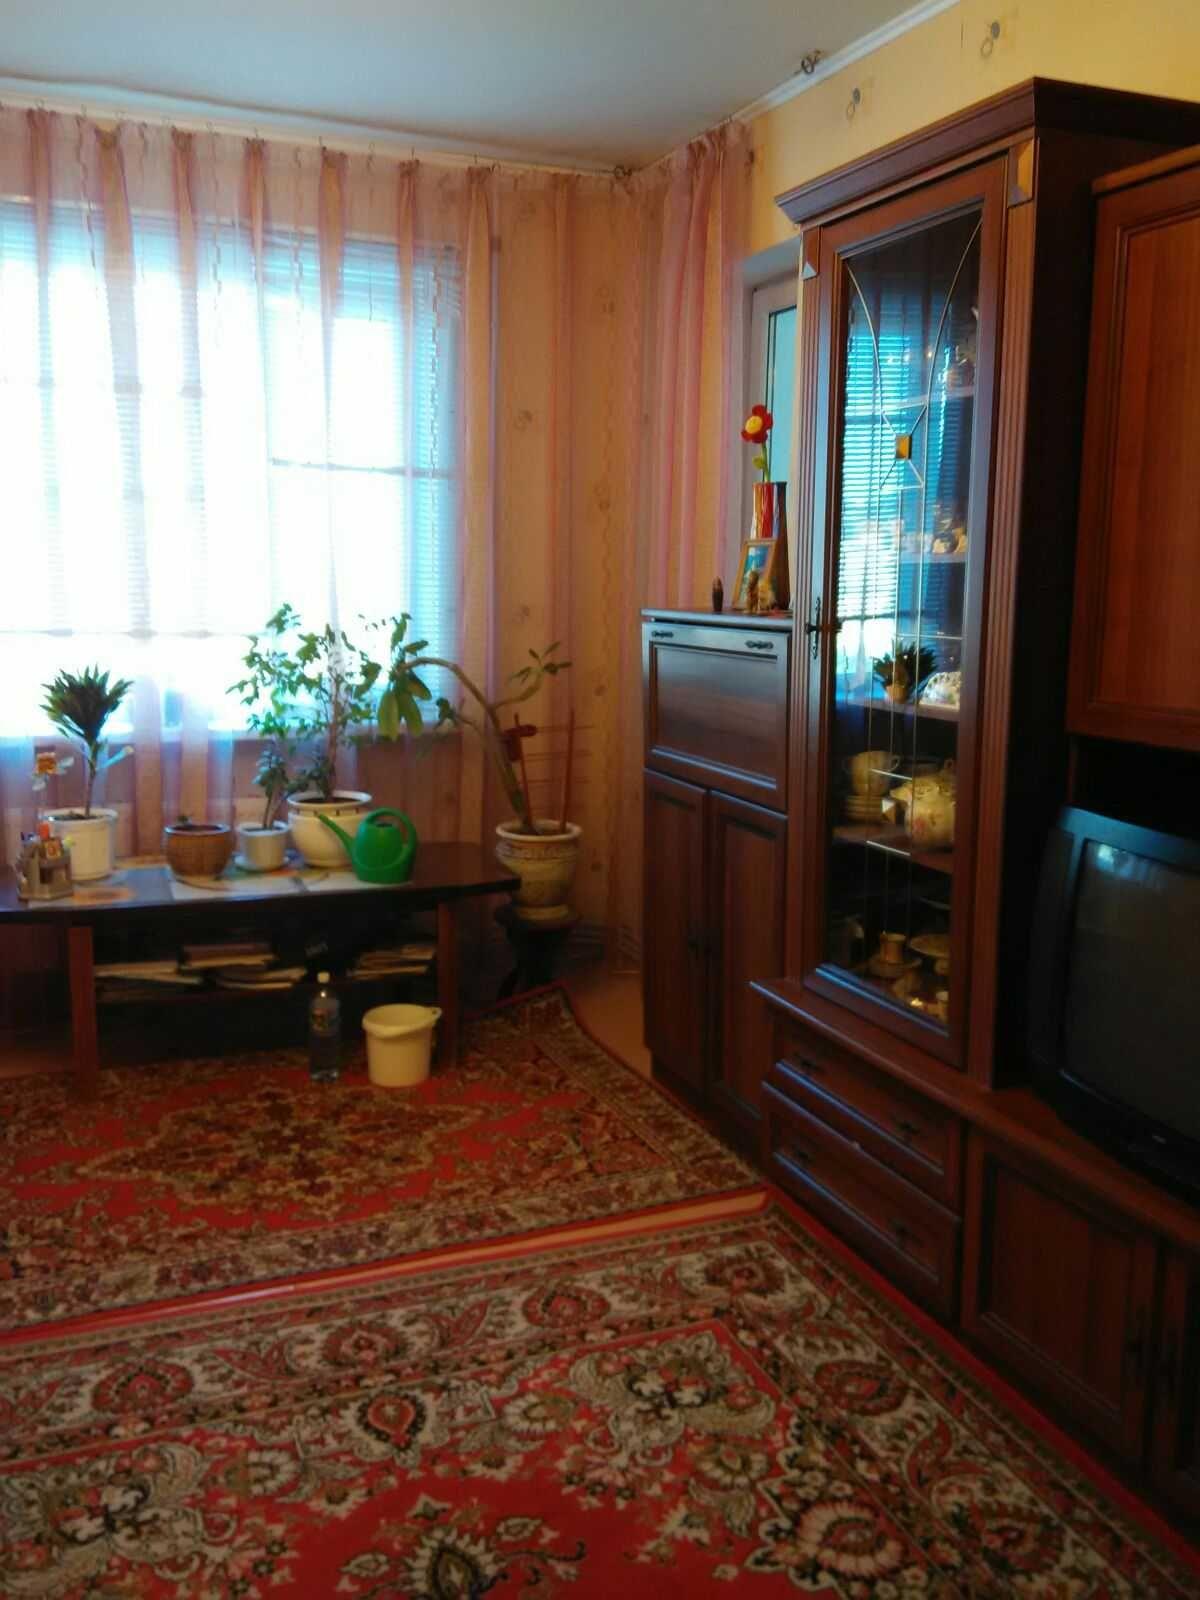 Продам 3-х комнатную квартиру Городок з-да ОР с АО